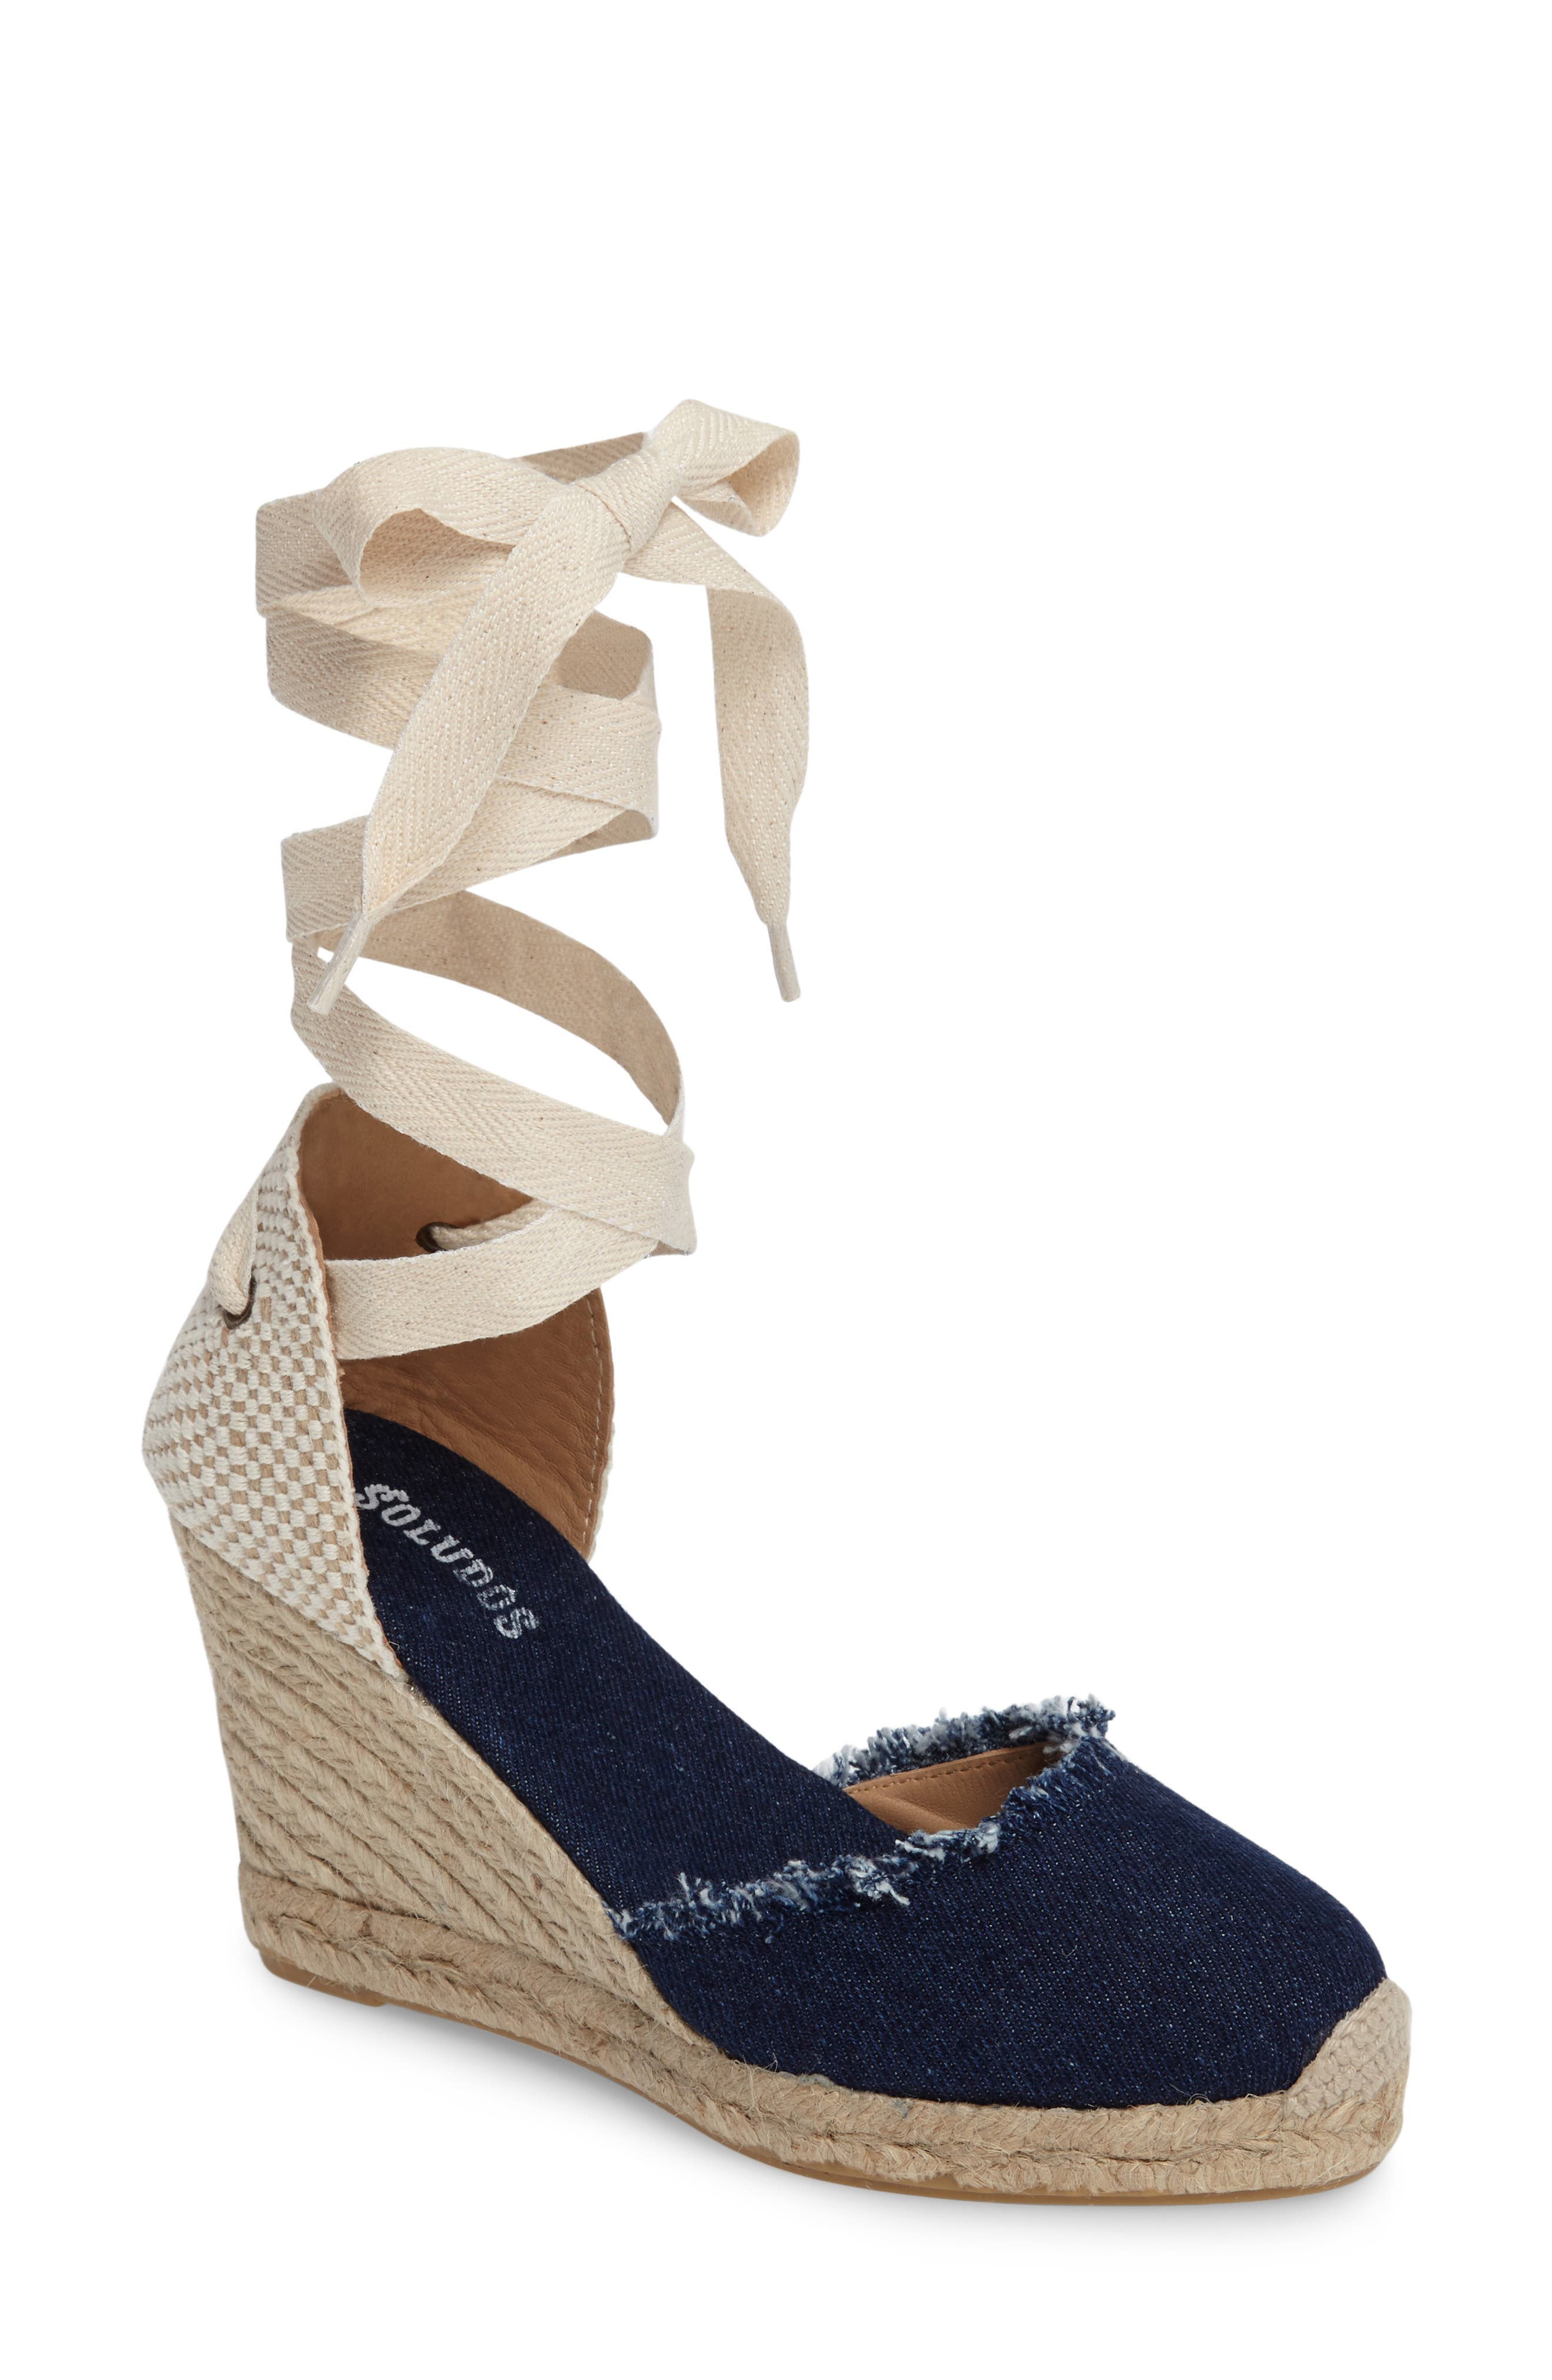 Wedge Lace-Up Espadrille Sandal,                         Main,                         color, Dark Denim